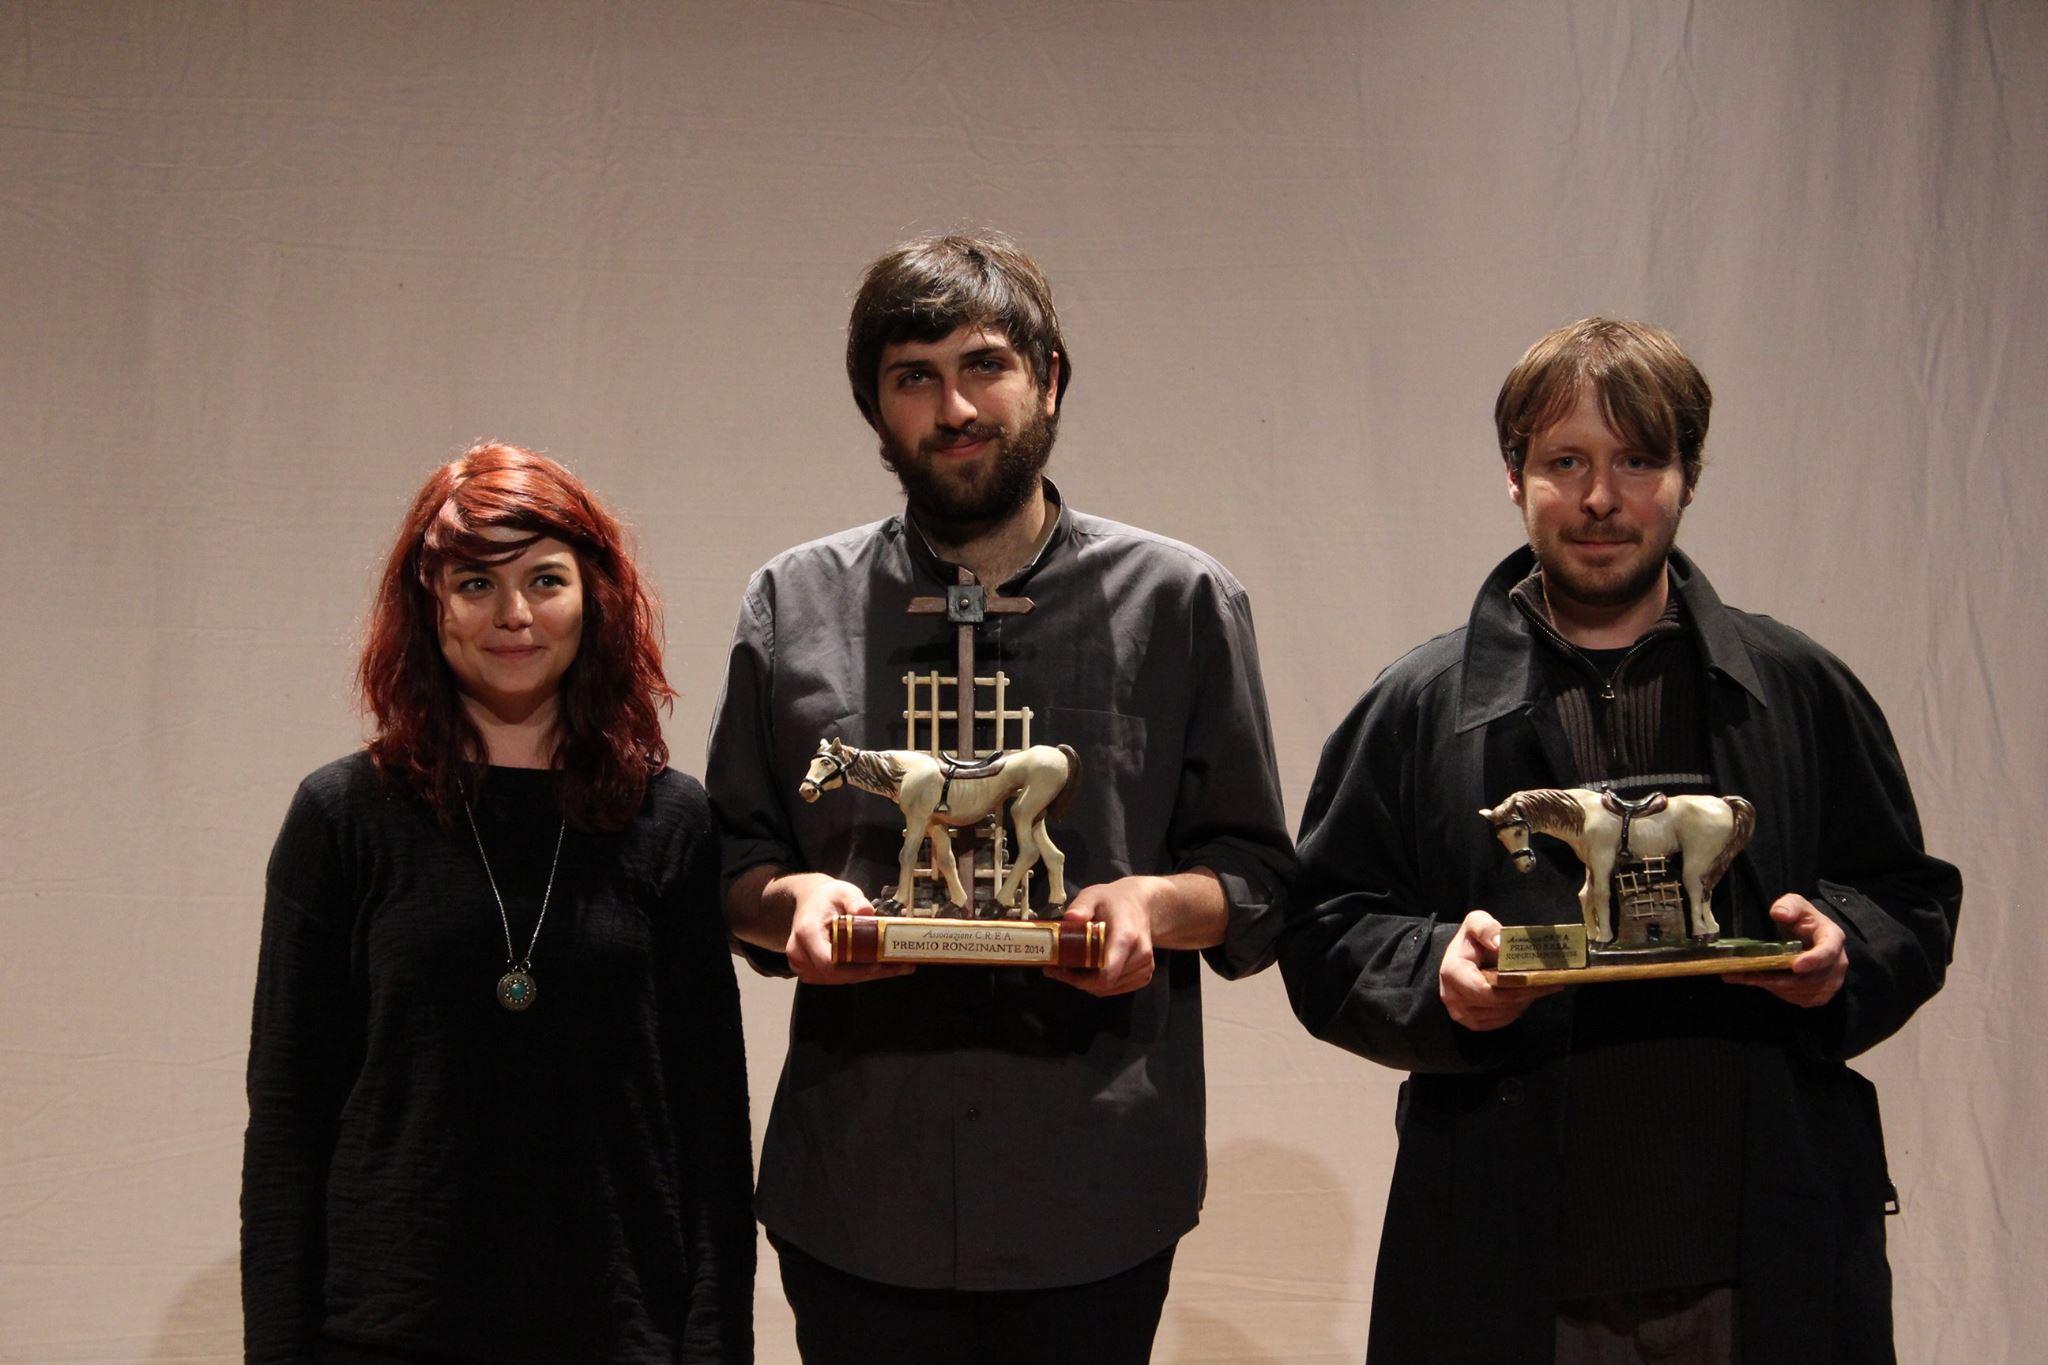 Vincitori Premio Ronzinante 2013